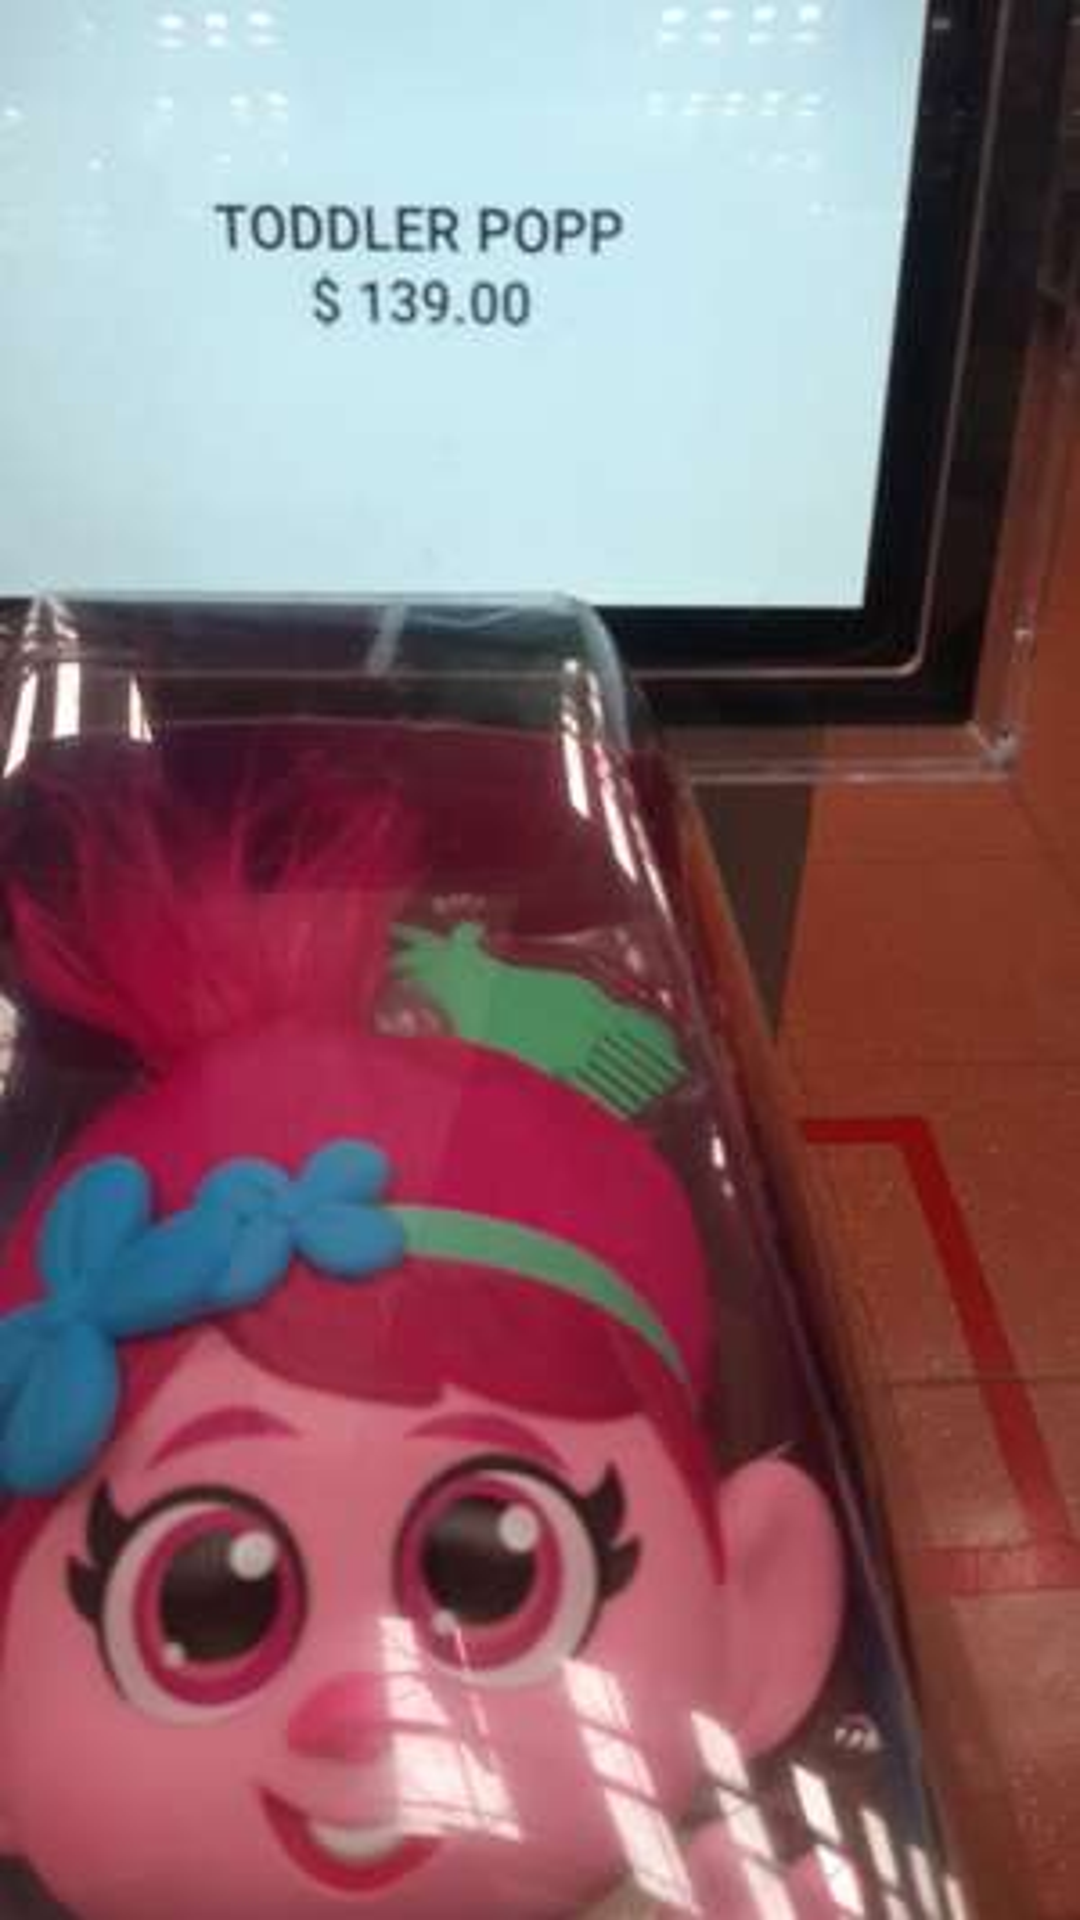 Walmart: Poppy world tour